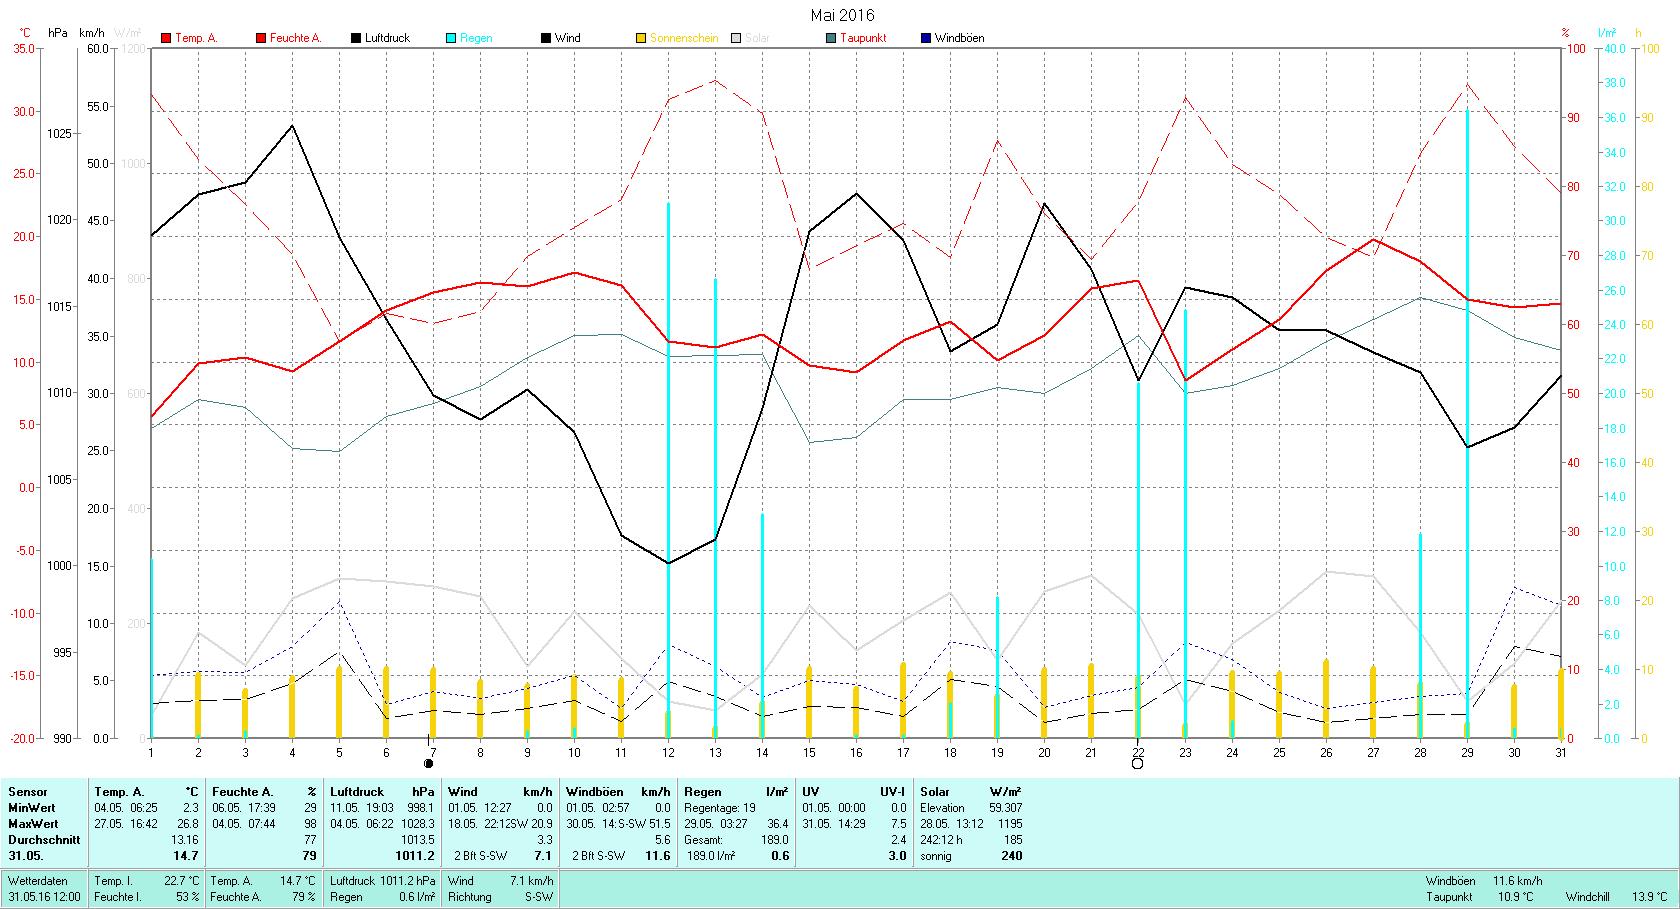 Mai 2016 Tmin 2.3°C, Tmax 26.8°C, Sonne 242:12h, Niederschlag 189.0mm/2